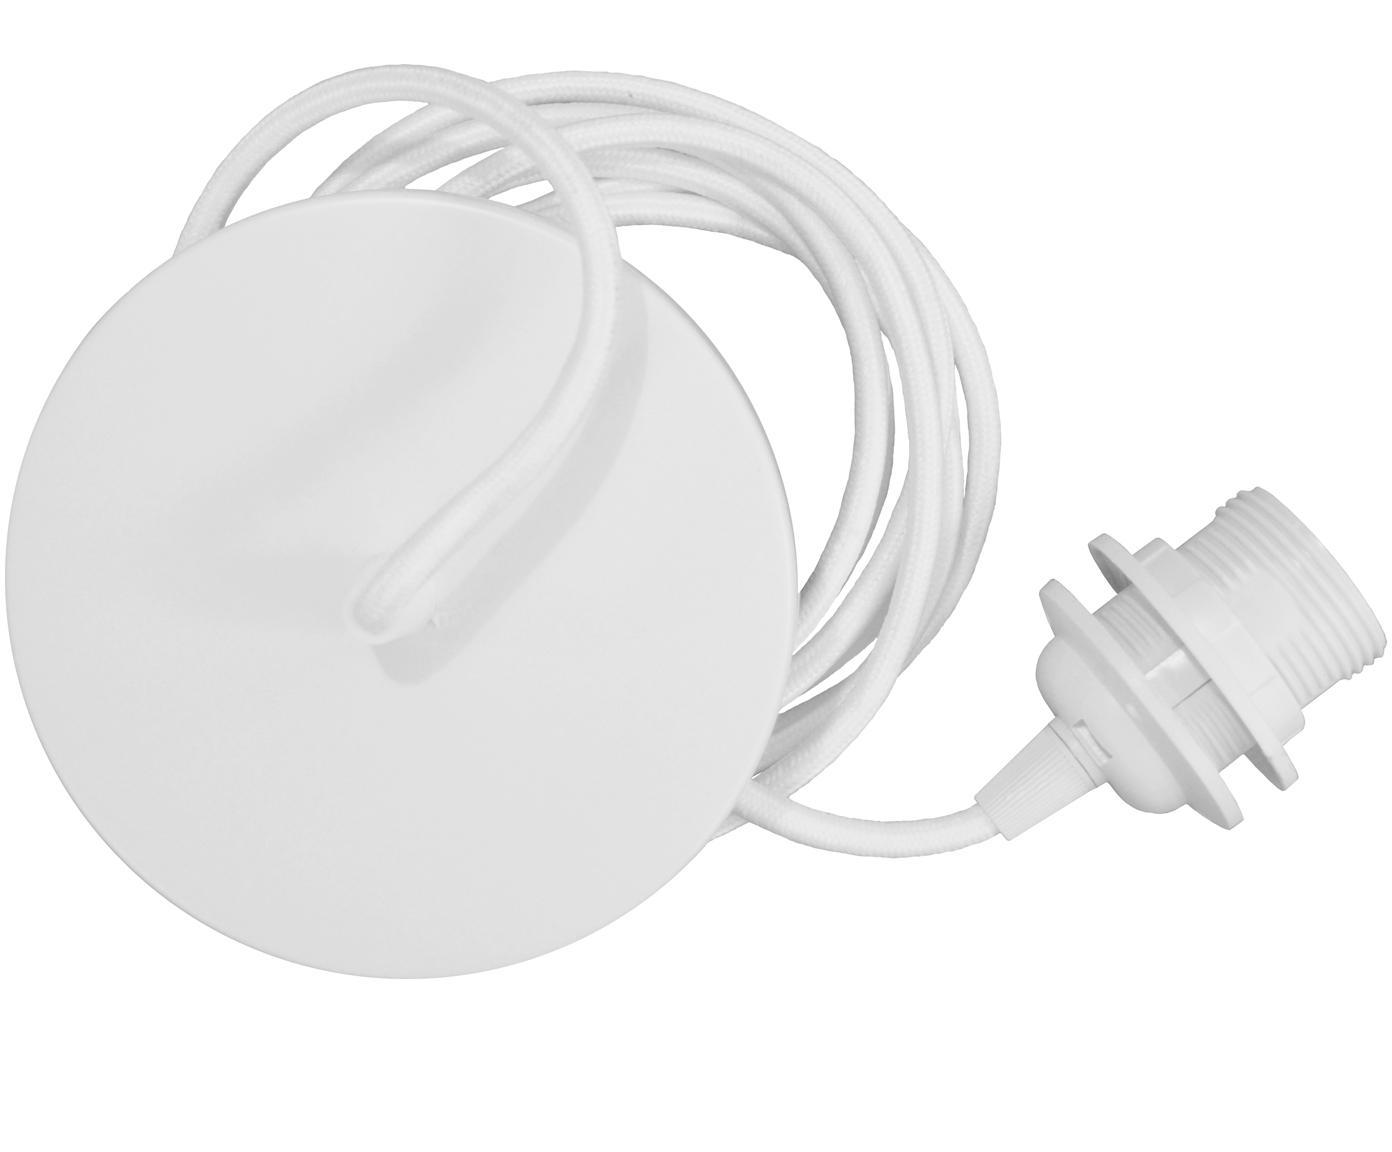 Cable con zócalo Umage, Anclaje: aluminio, Cable: tela, Blanco, Ø 14 x Al 3 cm